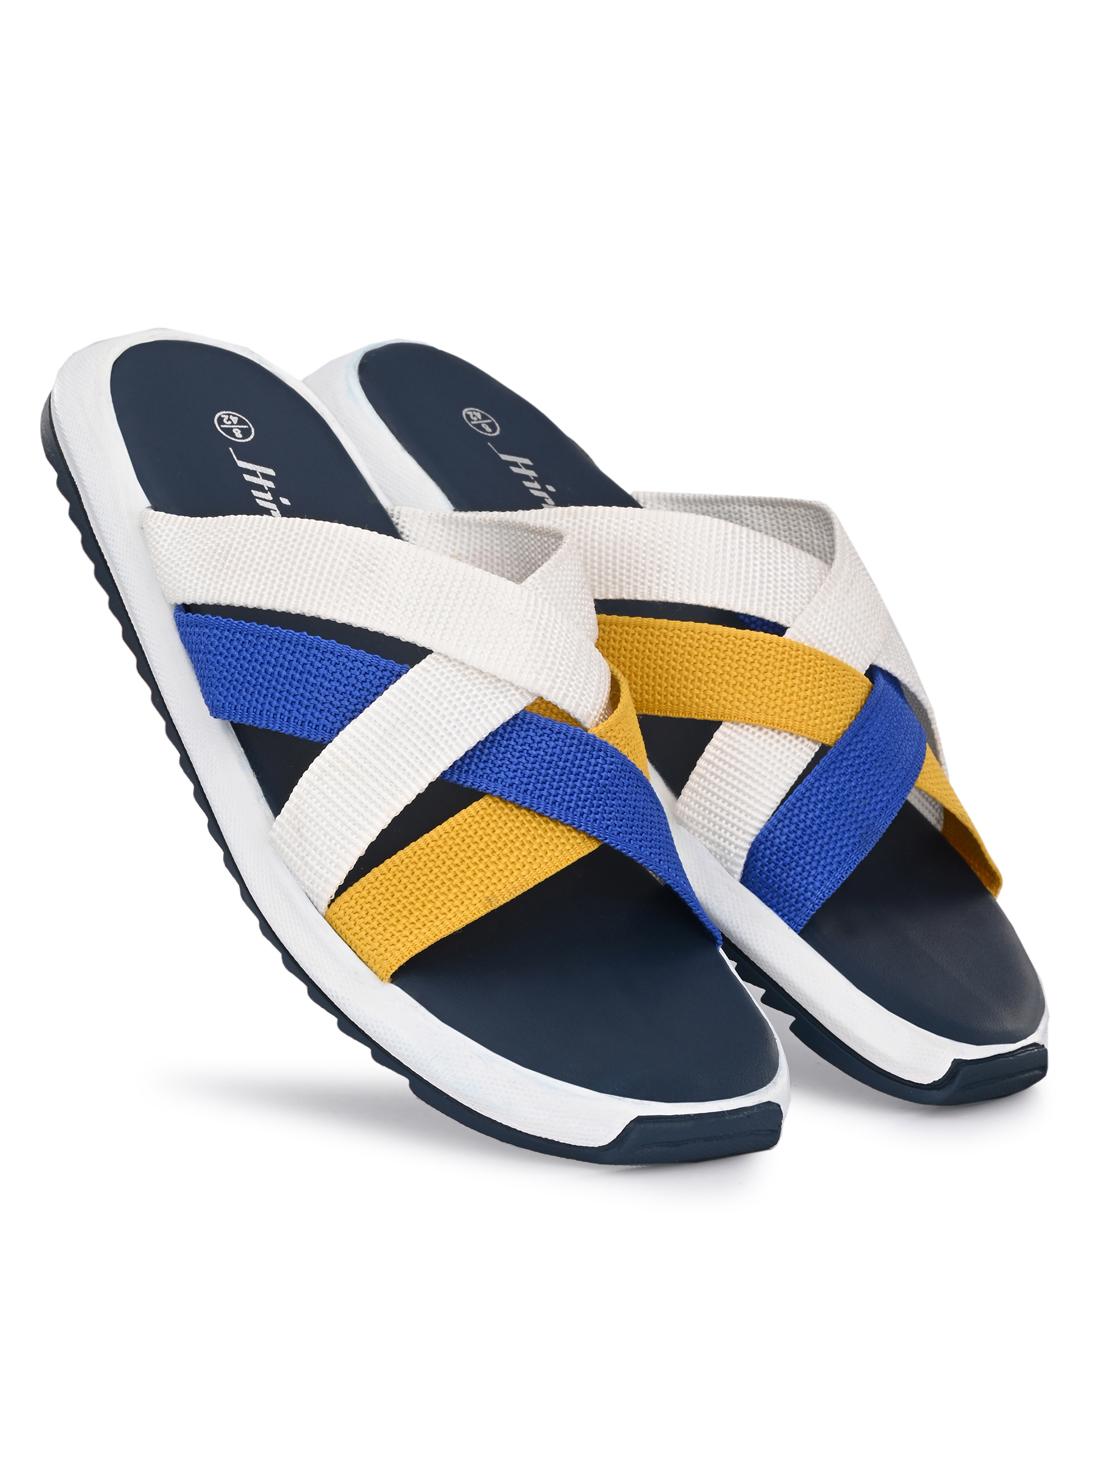 Hirolas | Hirolas® Men's Blue Multi Strap Flip-Flop Slider Slippers (UK6/EU40)